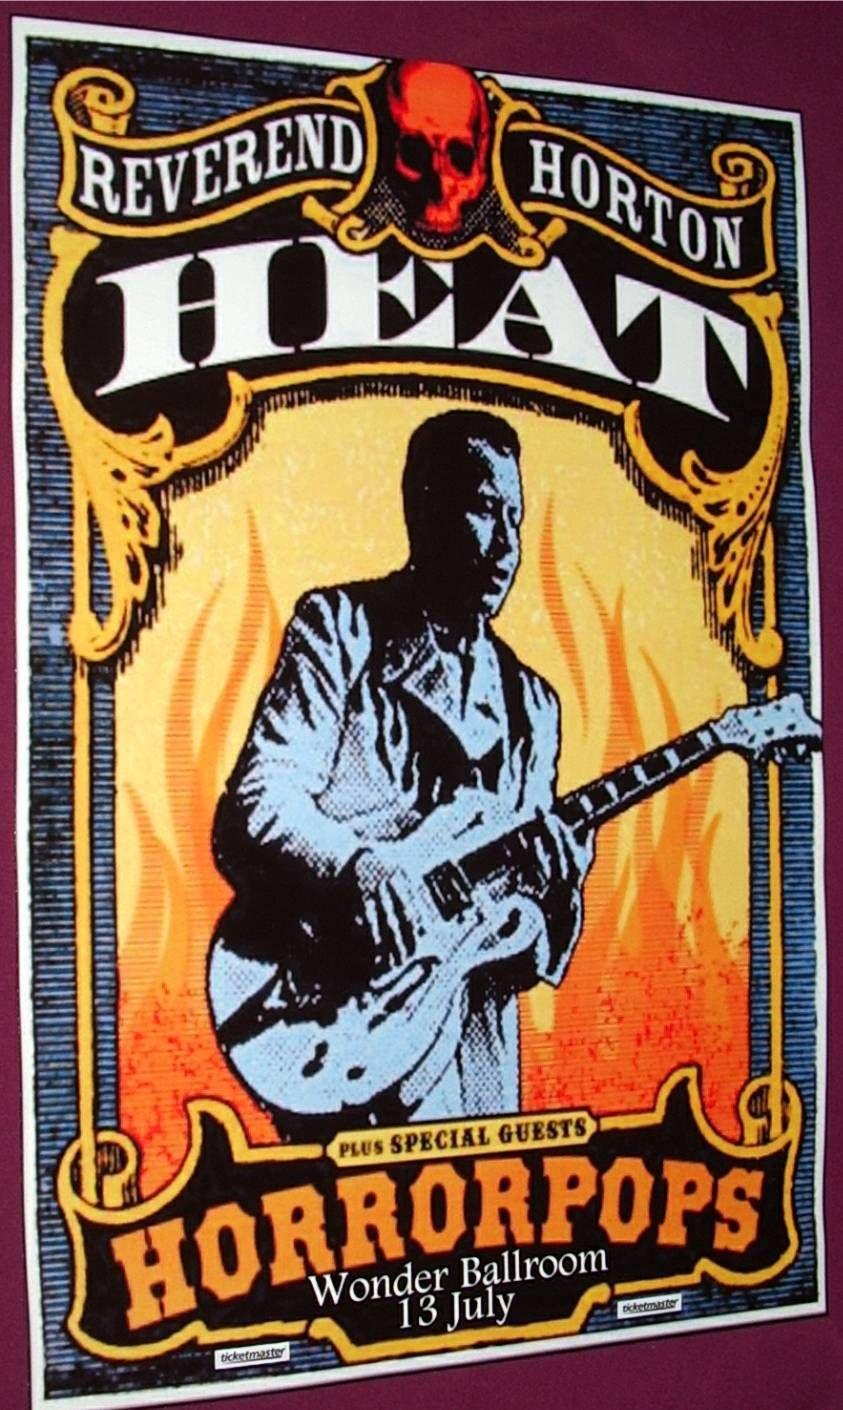 Reverend Horton Heat Poster Concert 9 84 Reverendhortonheat